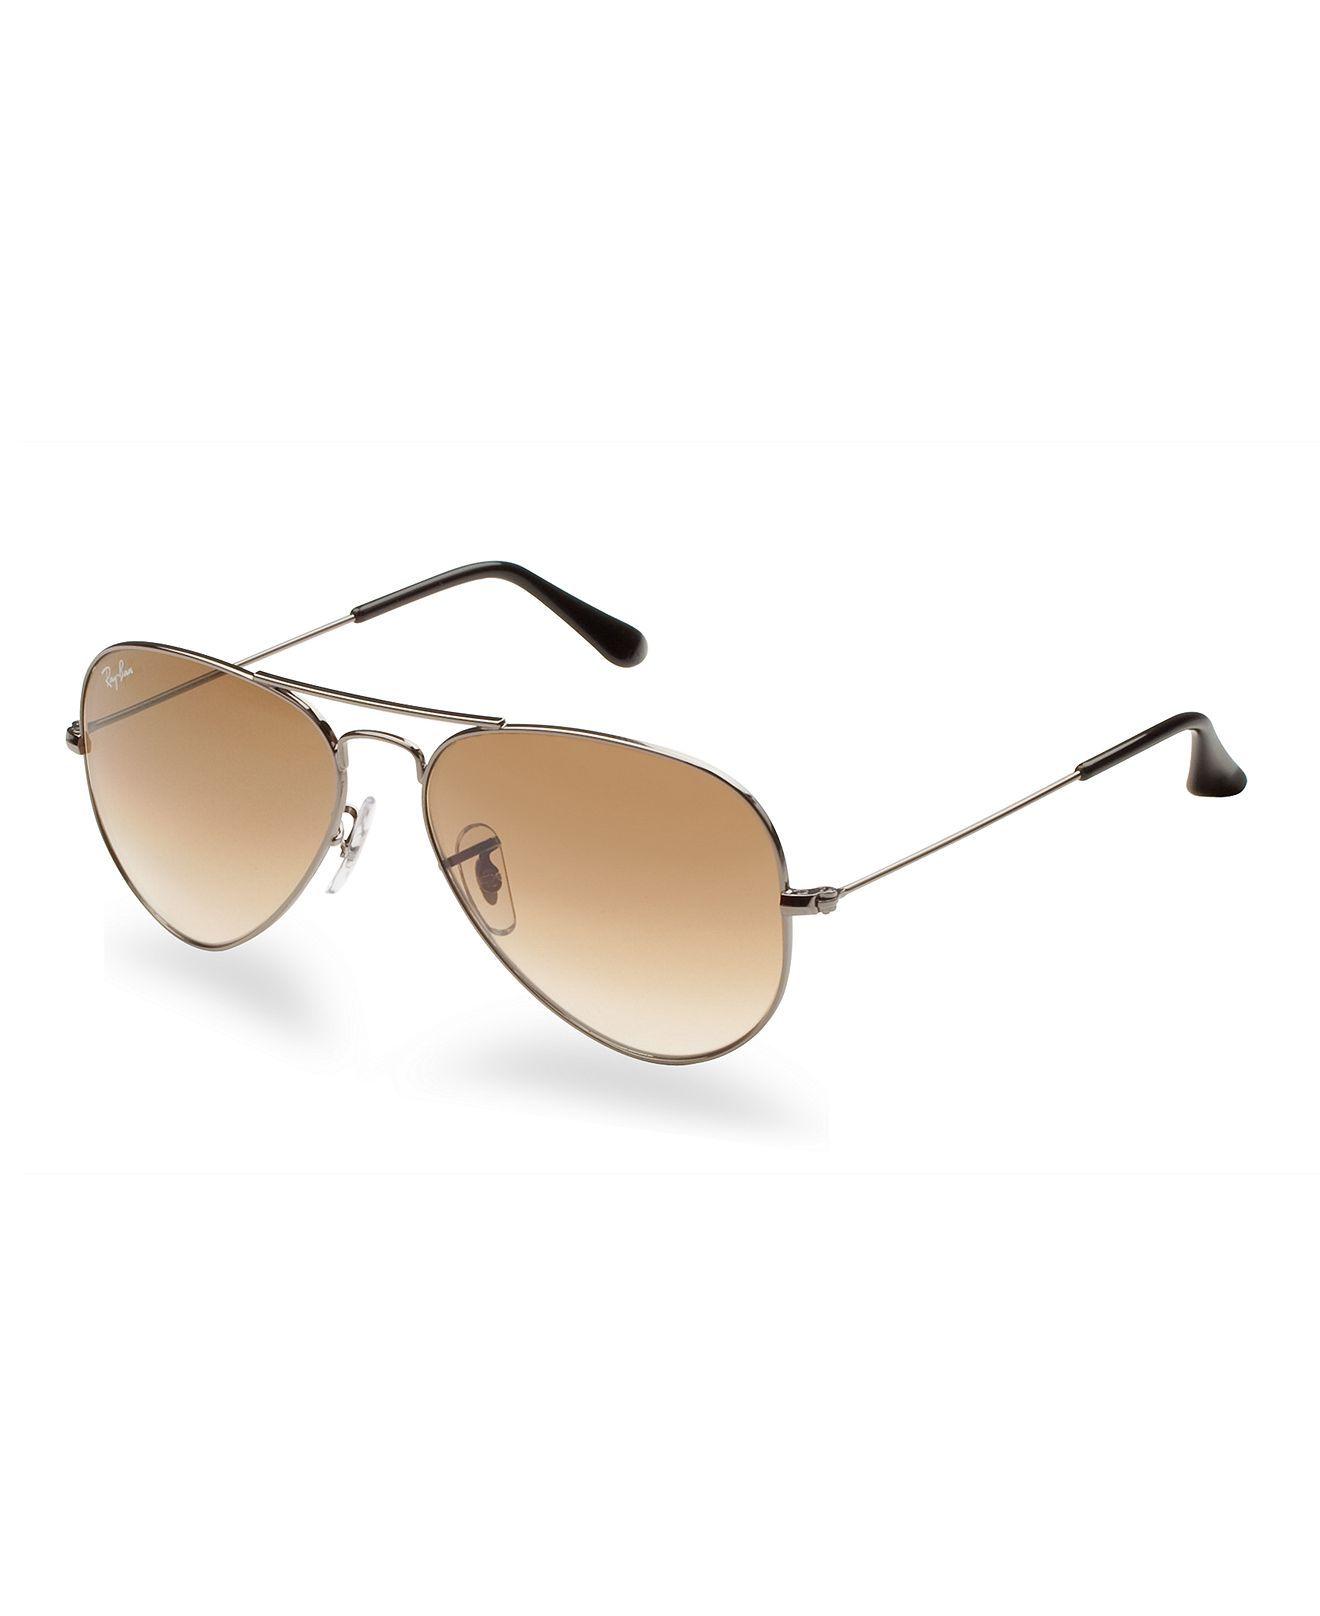 Colorful Sunglass Hut: $149.95 Ray-Ban Sunglasses, RB3025 55 Aviator